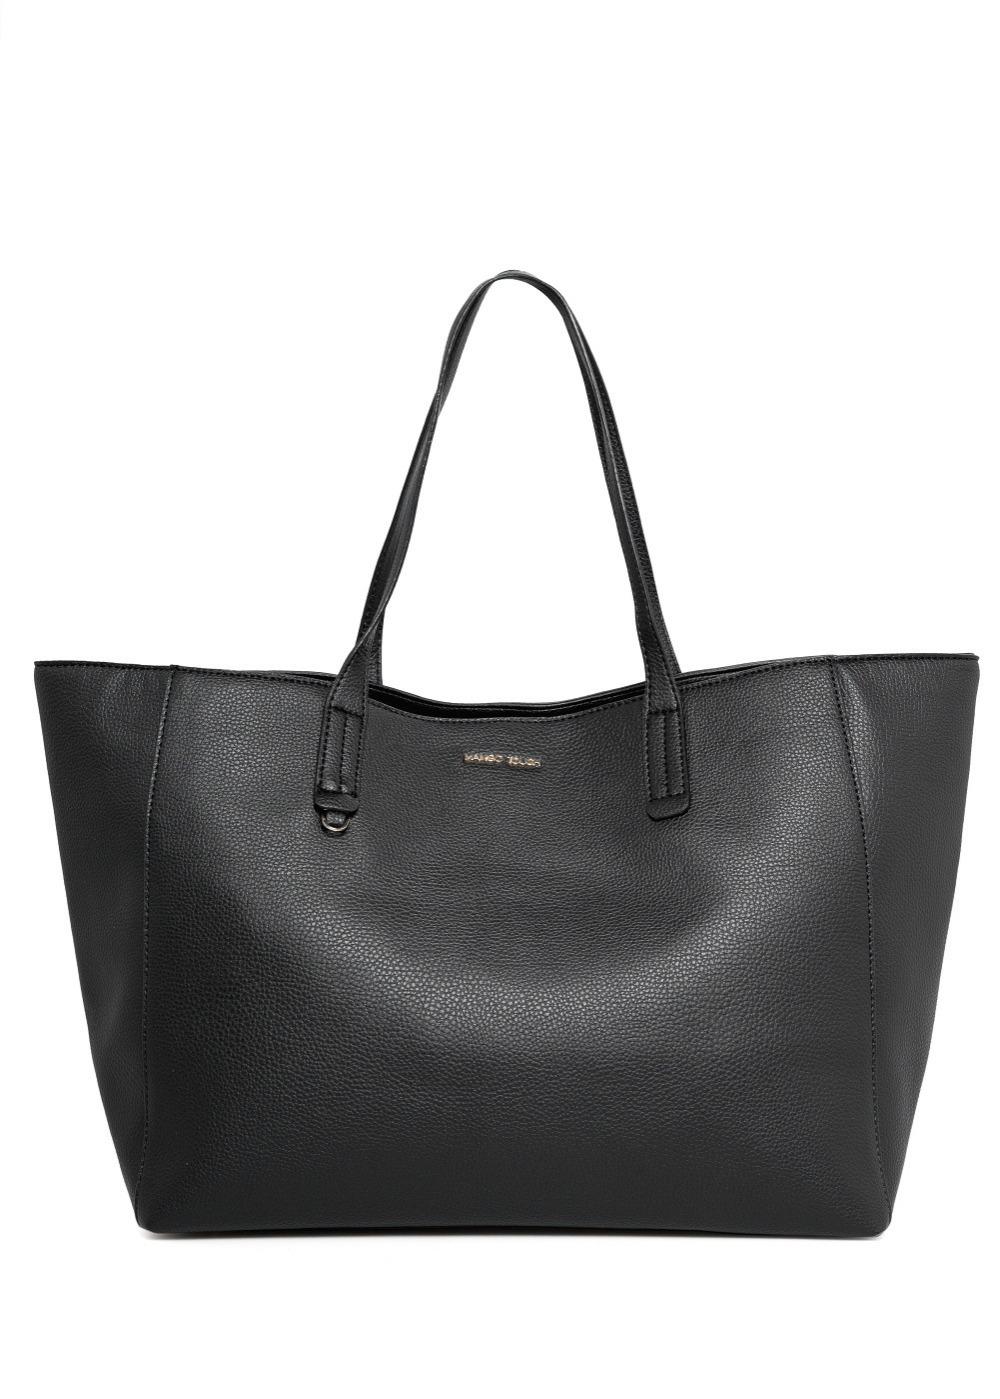 designer handbags high quality,bags women famous brands,bolsa feminina,women leather handbags,fashion shoulder bags#003 - LF Fashion Boutique Shop store